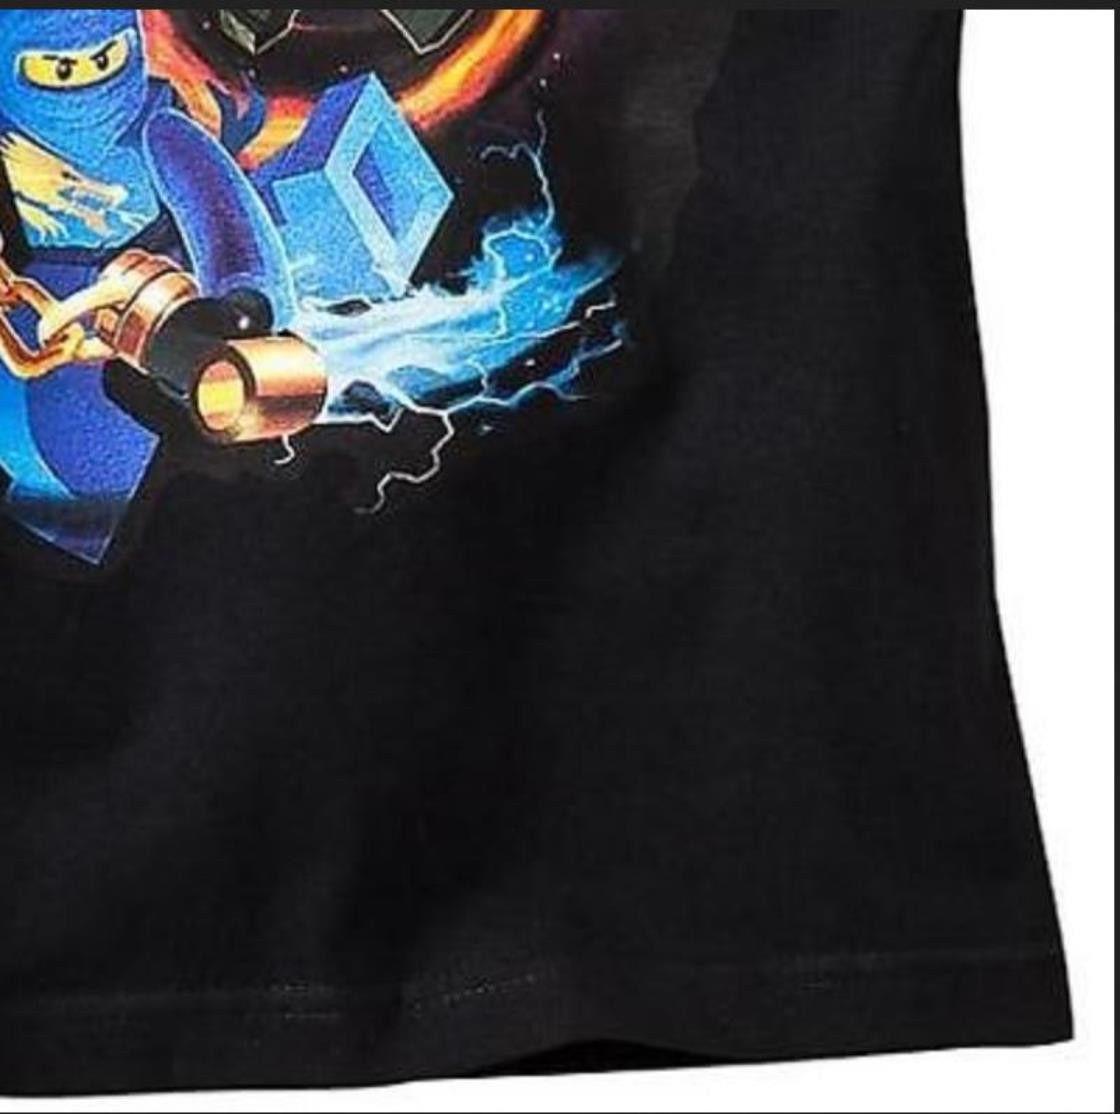 BOYS 10/12, 14/16 OR 18 - Lego Ninjago Masters of Spinjitzu Tornado T-SHIRT